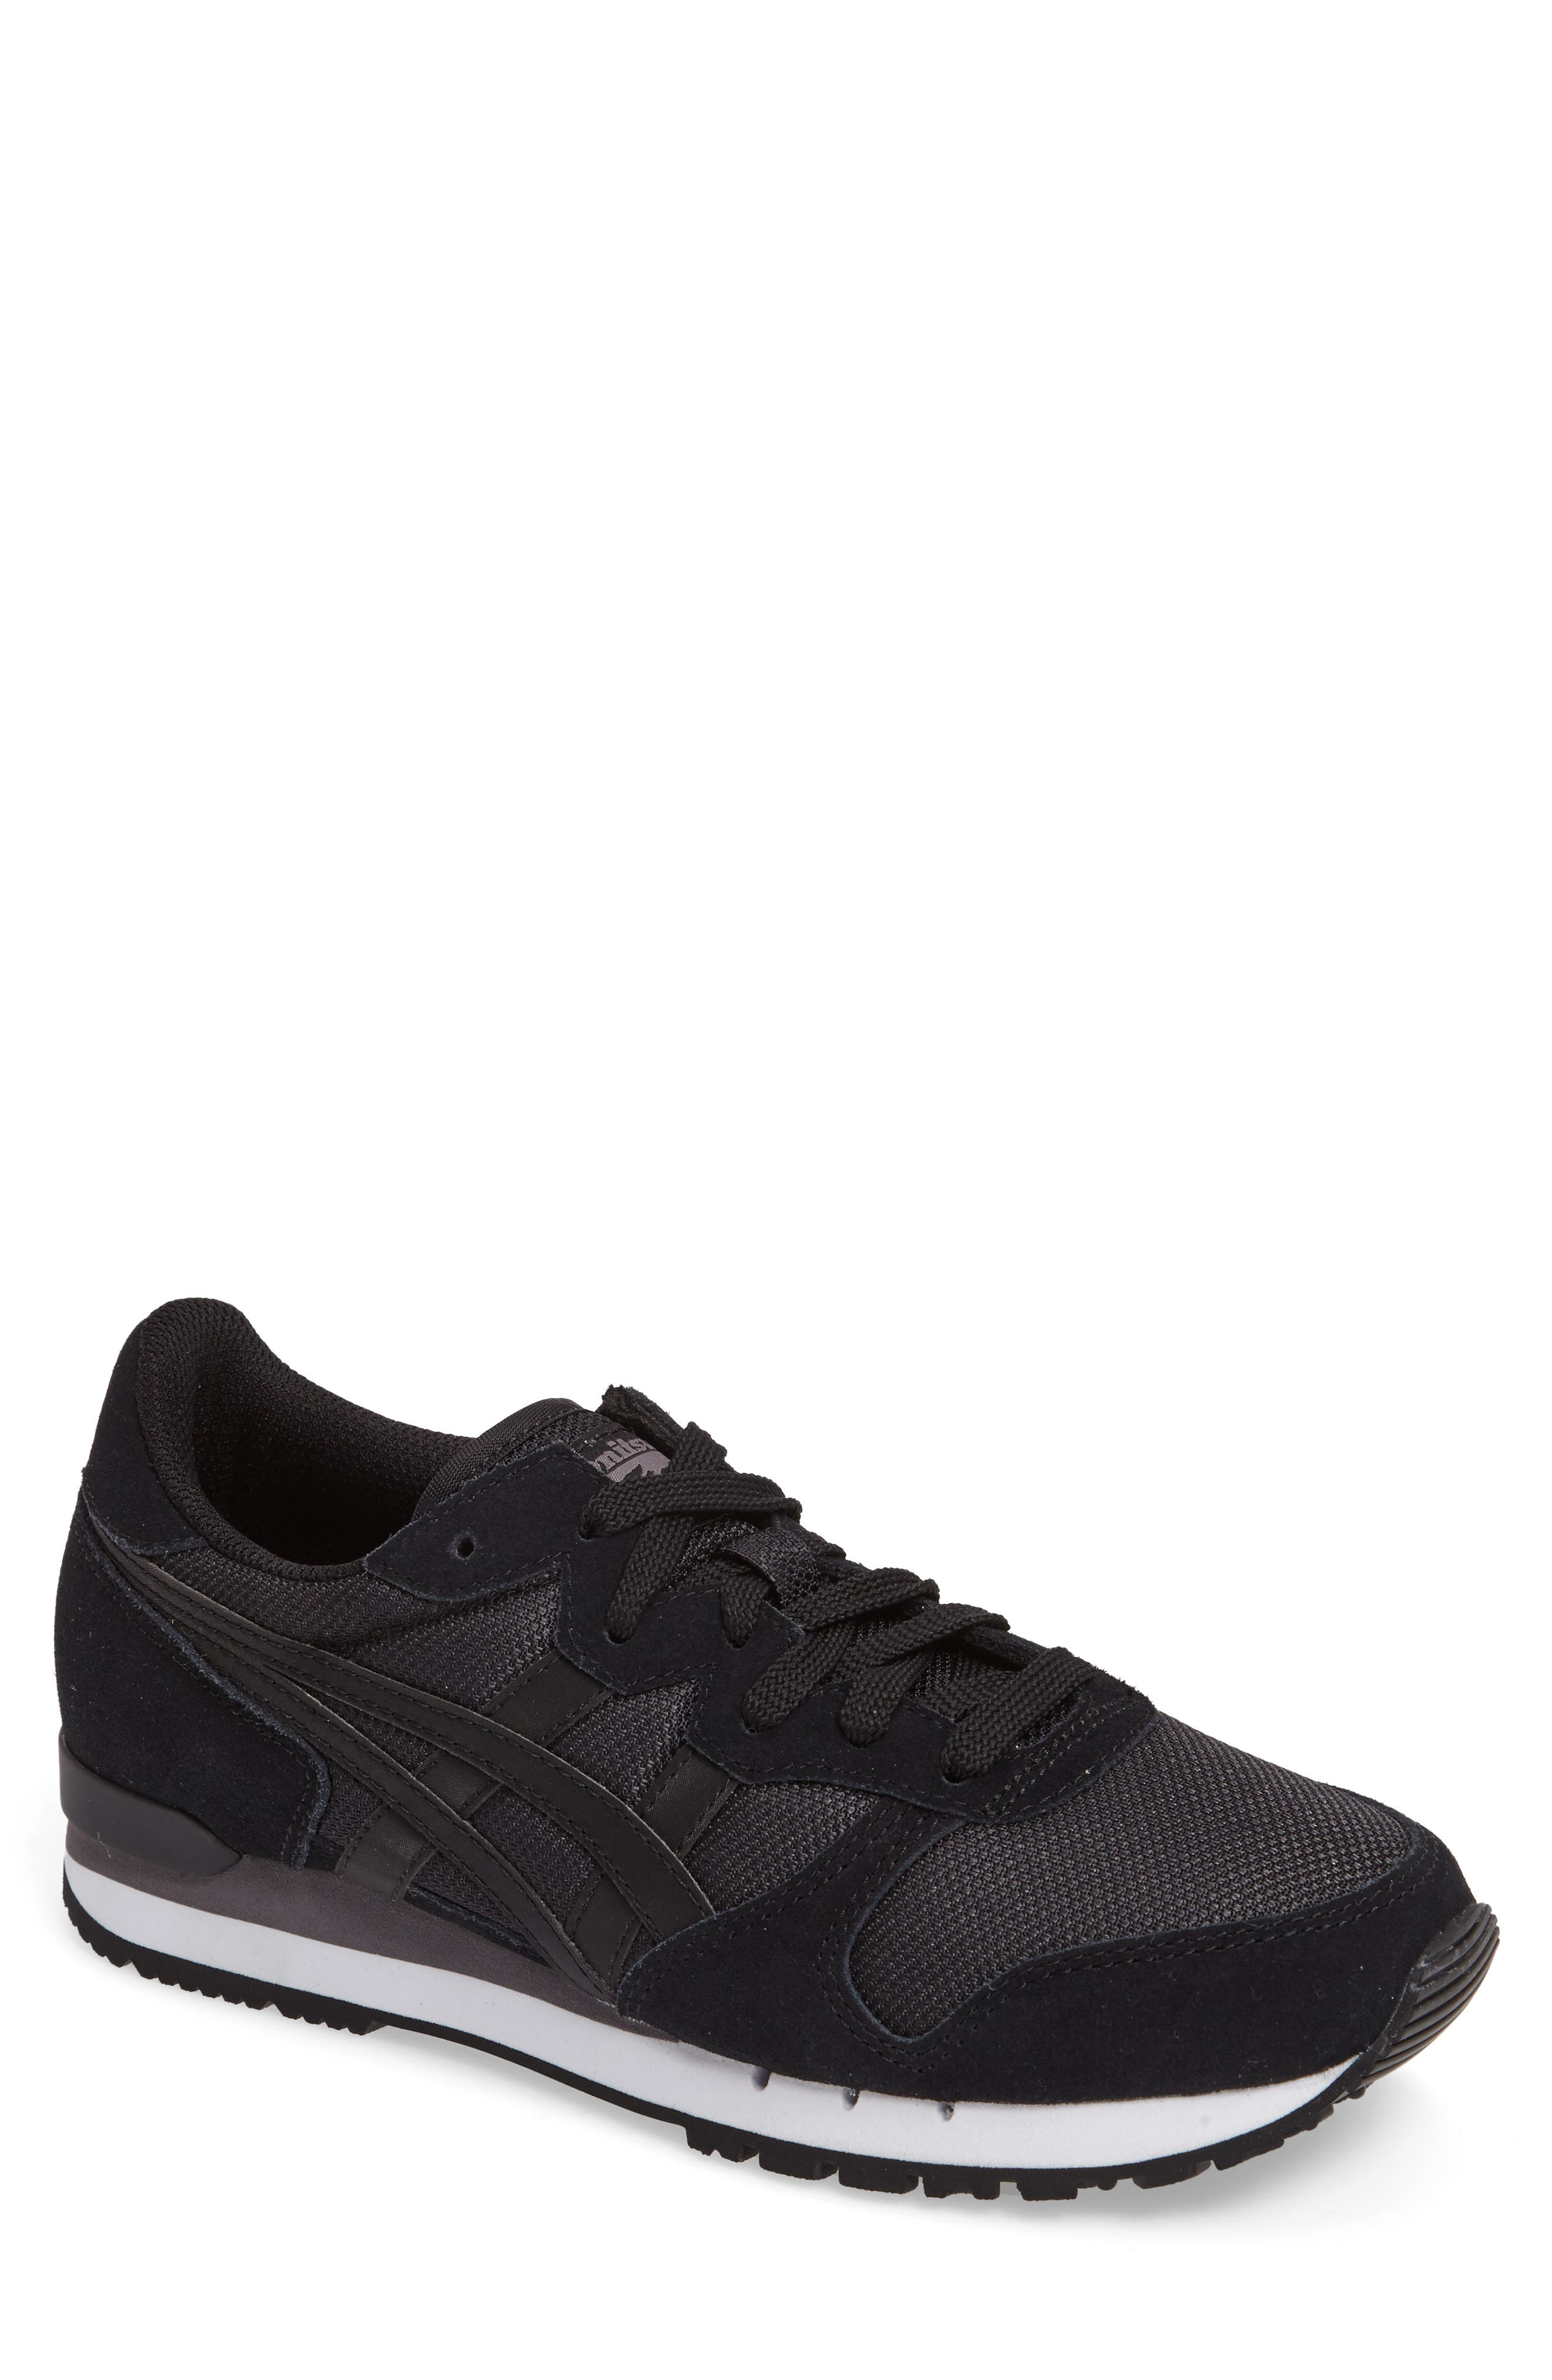 Alternate Image 1 Selected - Onitsuka Tiger™ Alvarado Sneaker (Men)